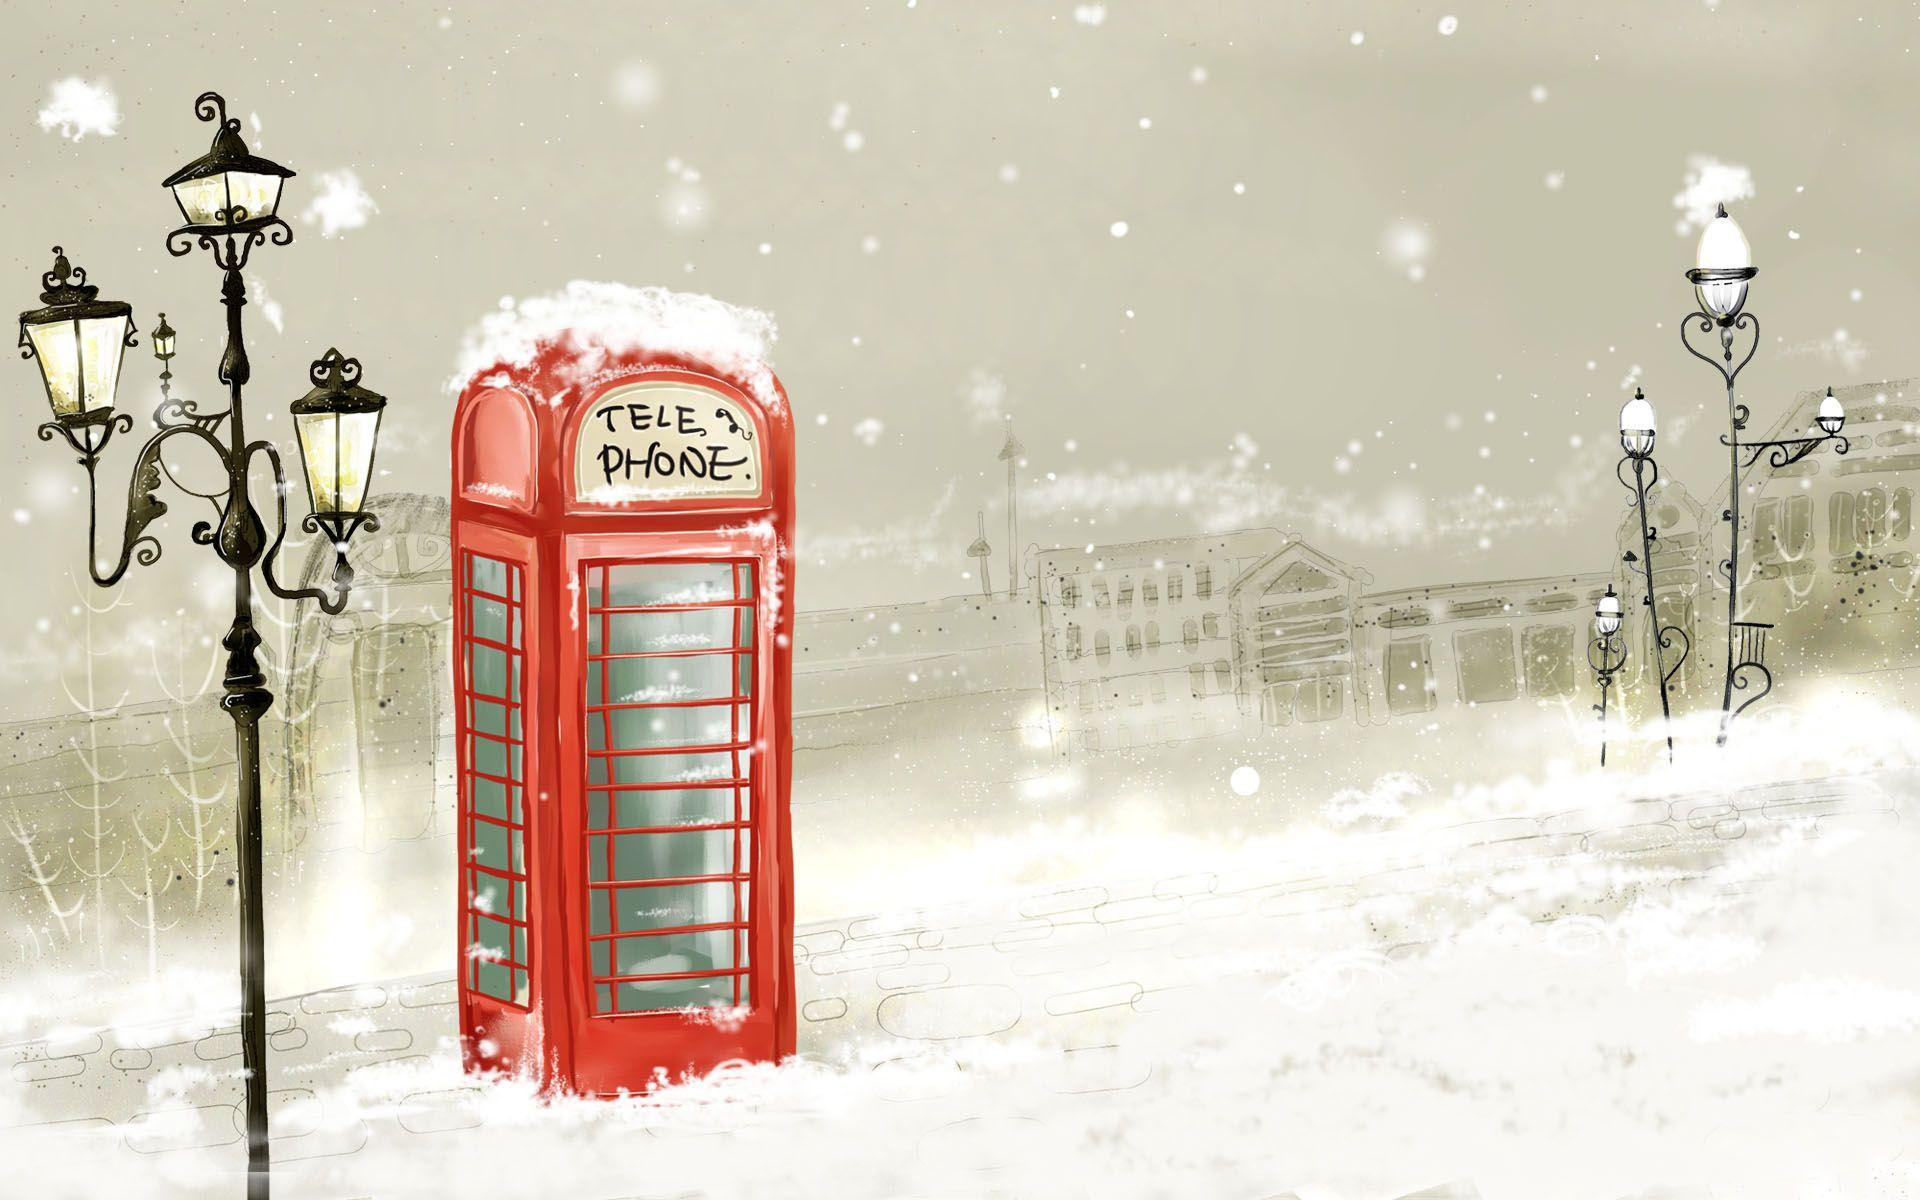 Http Imgs Mi9 Com Uploads Cartoon 485 Lonely Telephone Box 1920x1200 7404 Jpg Christmas Desktop Wallpaper Christmas Desktop Winter Wallpaper